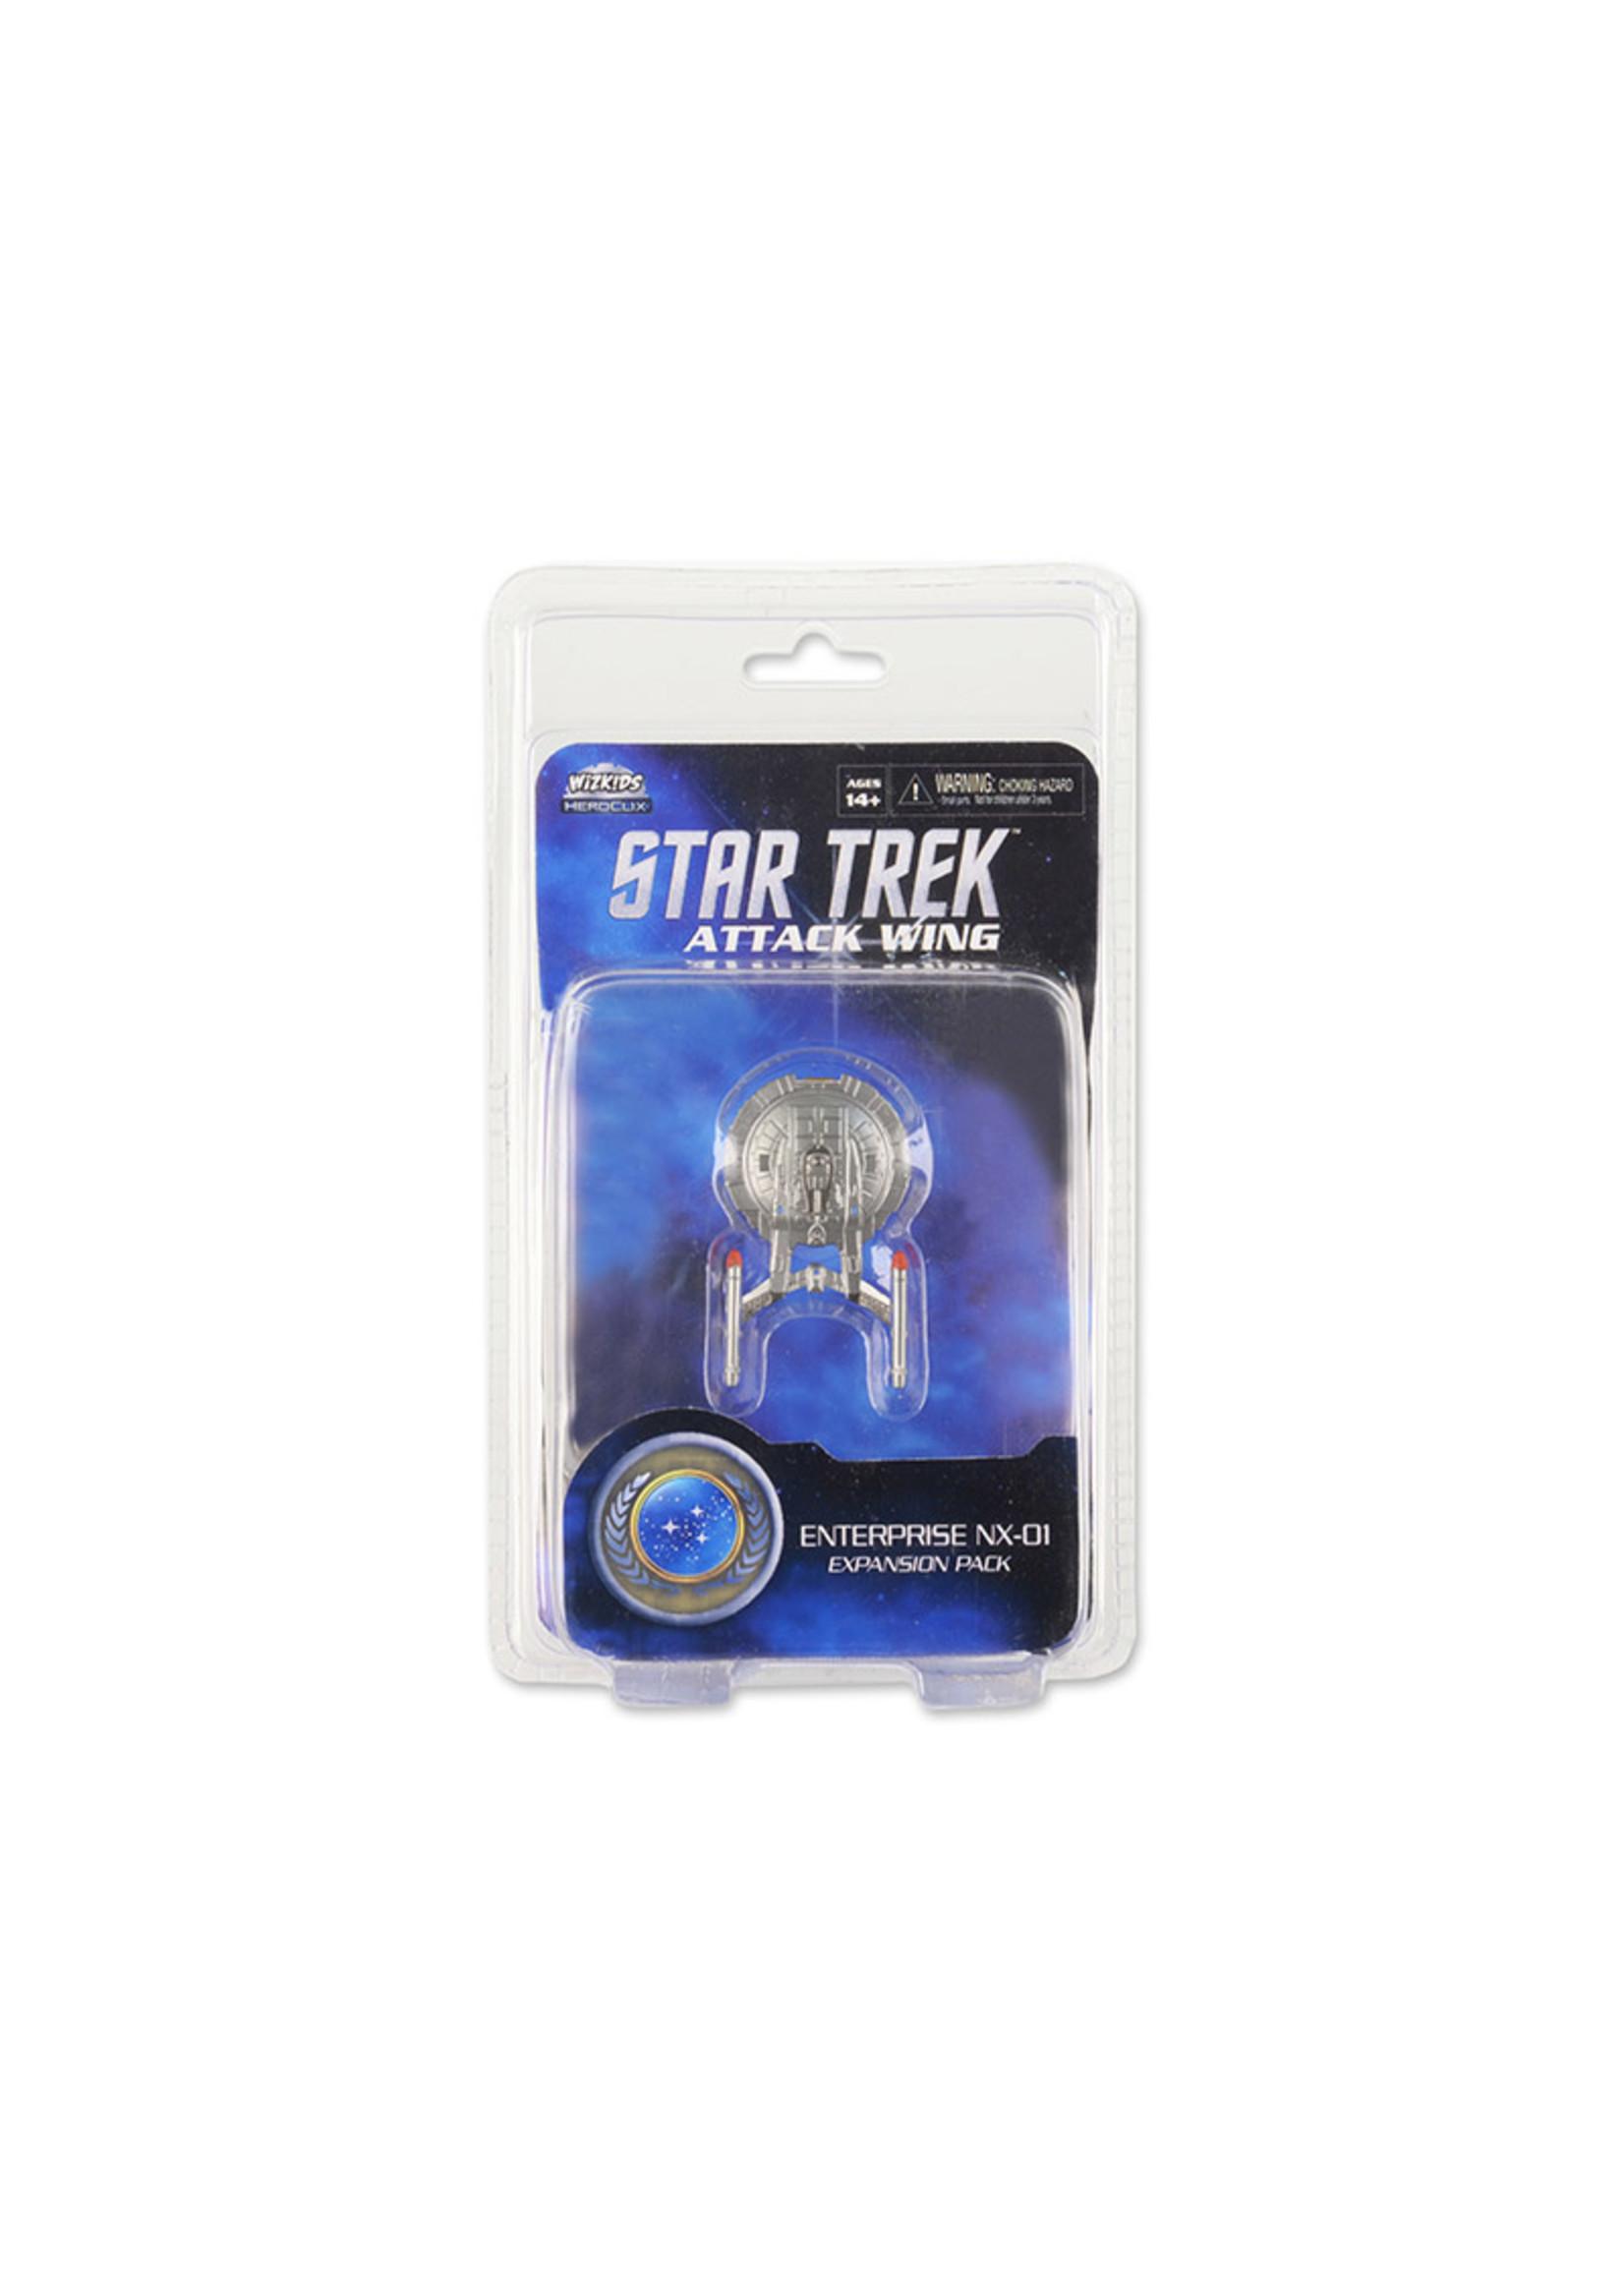 Star Trek Attack Wing: Wave 07 Federation Enterprise NX-01 Expansion Pack